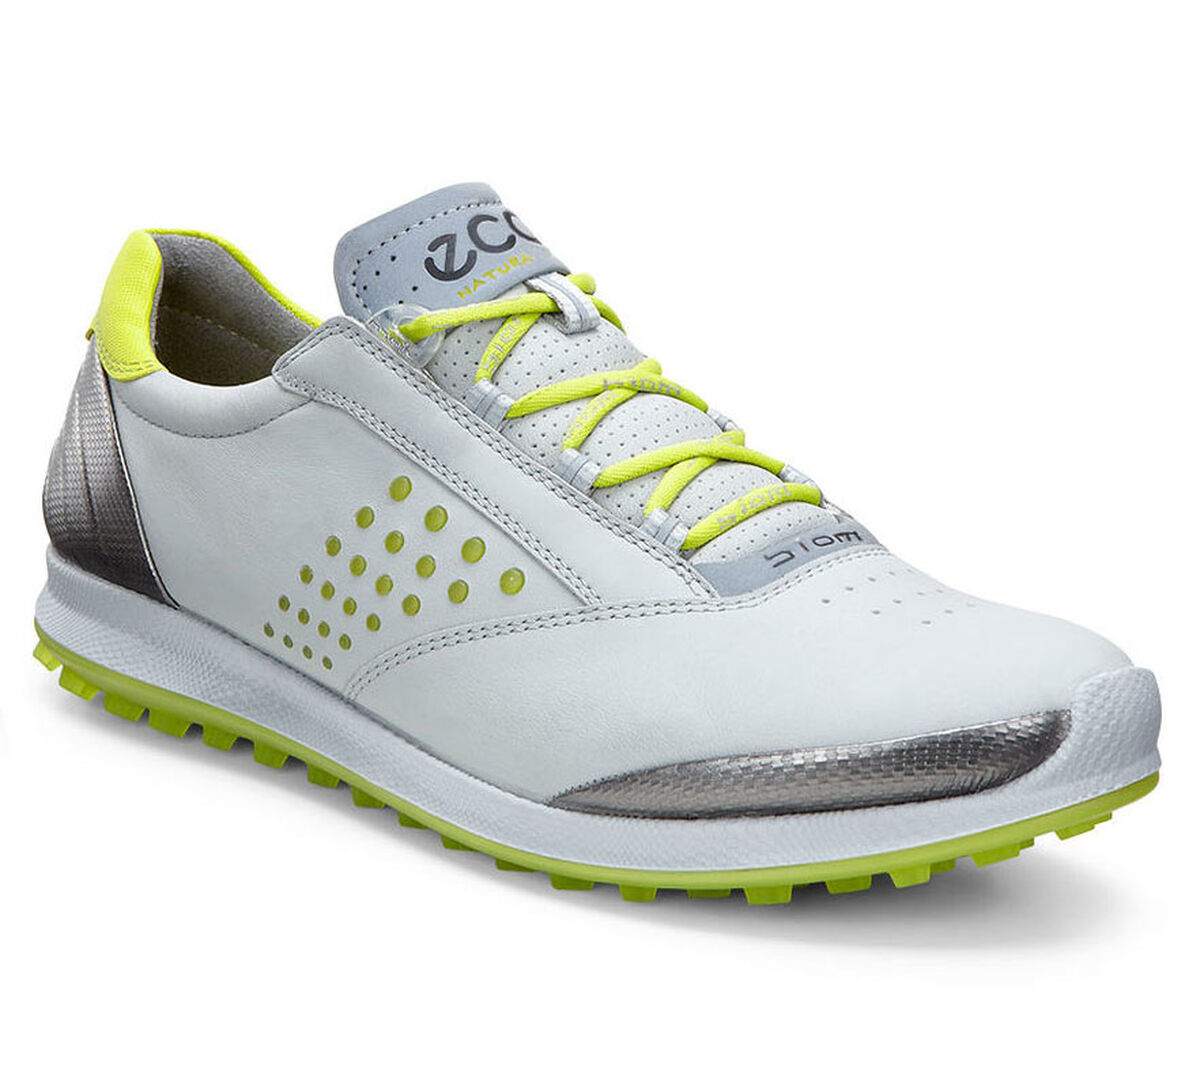 547423cd494f ECCO BIOM Hybrid 2 Women s Golf Shoe - Grey Yellow Shop Now